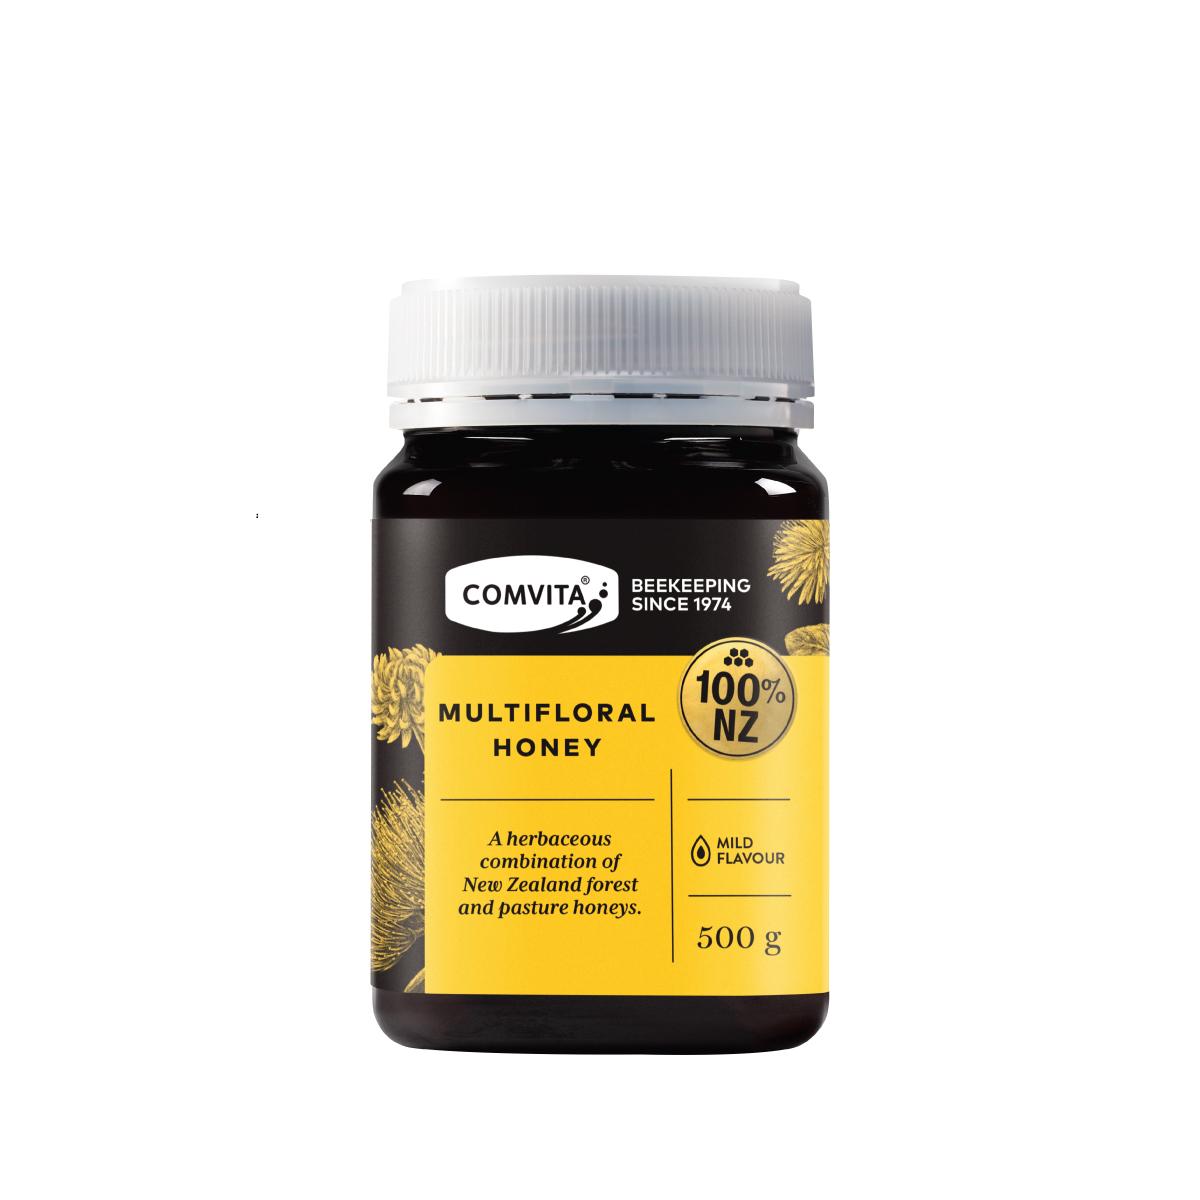 Comvita Multifloral Manuka Honey